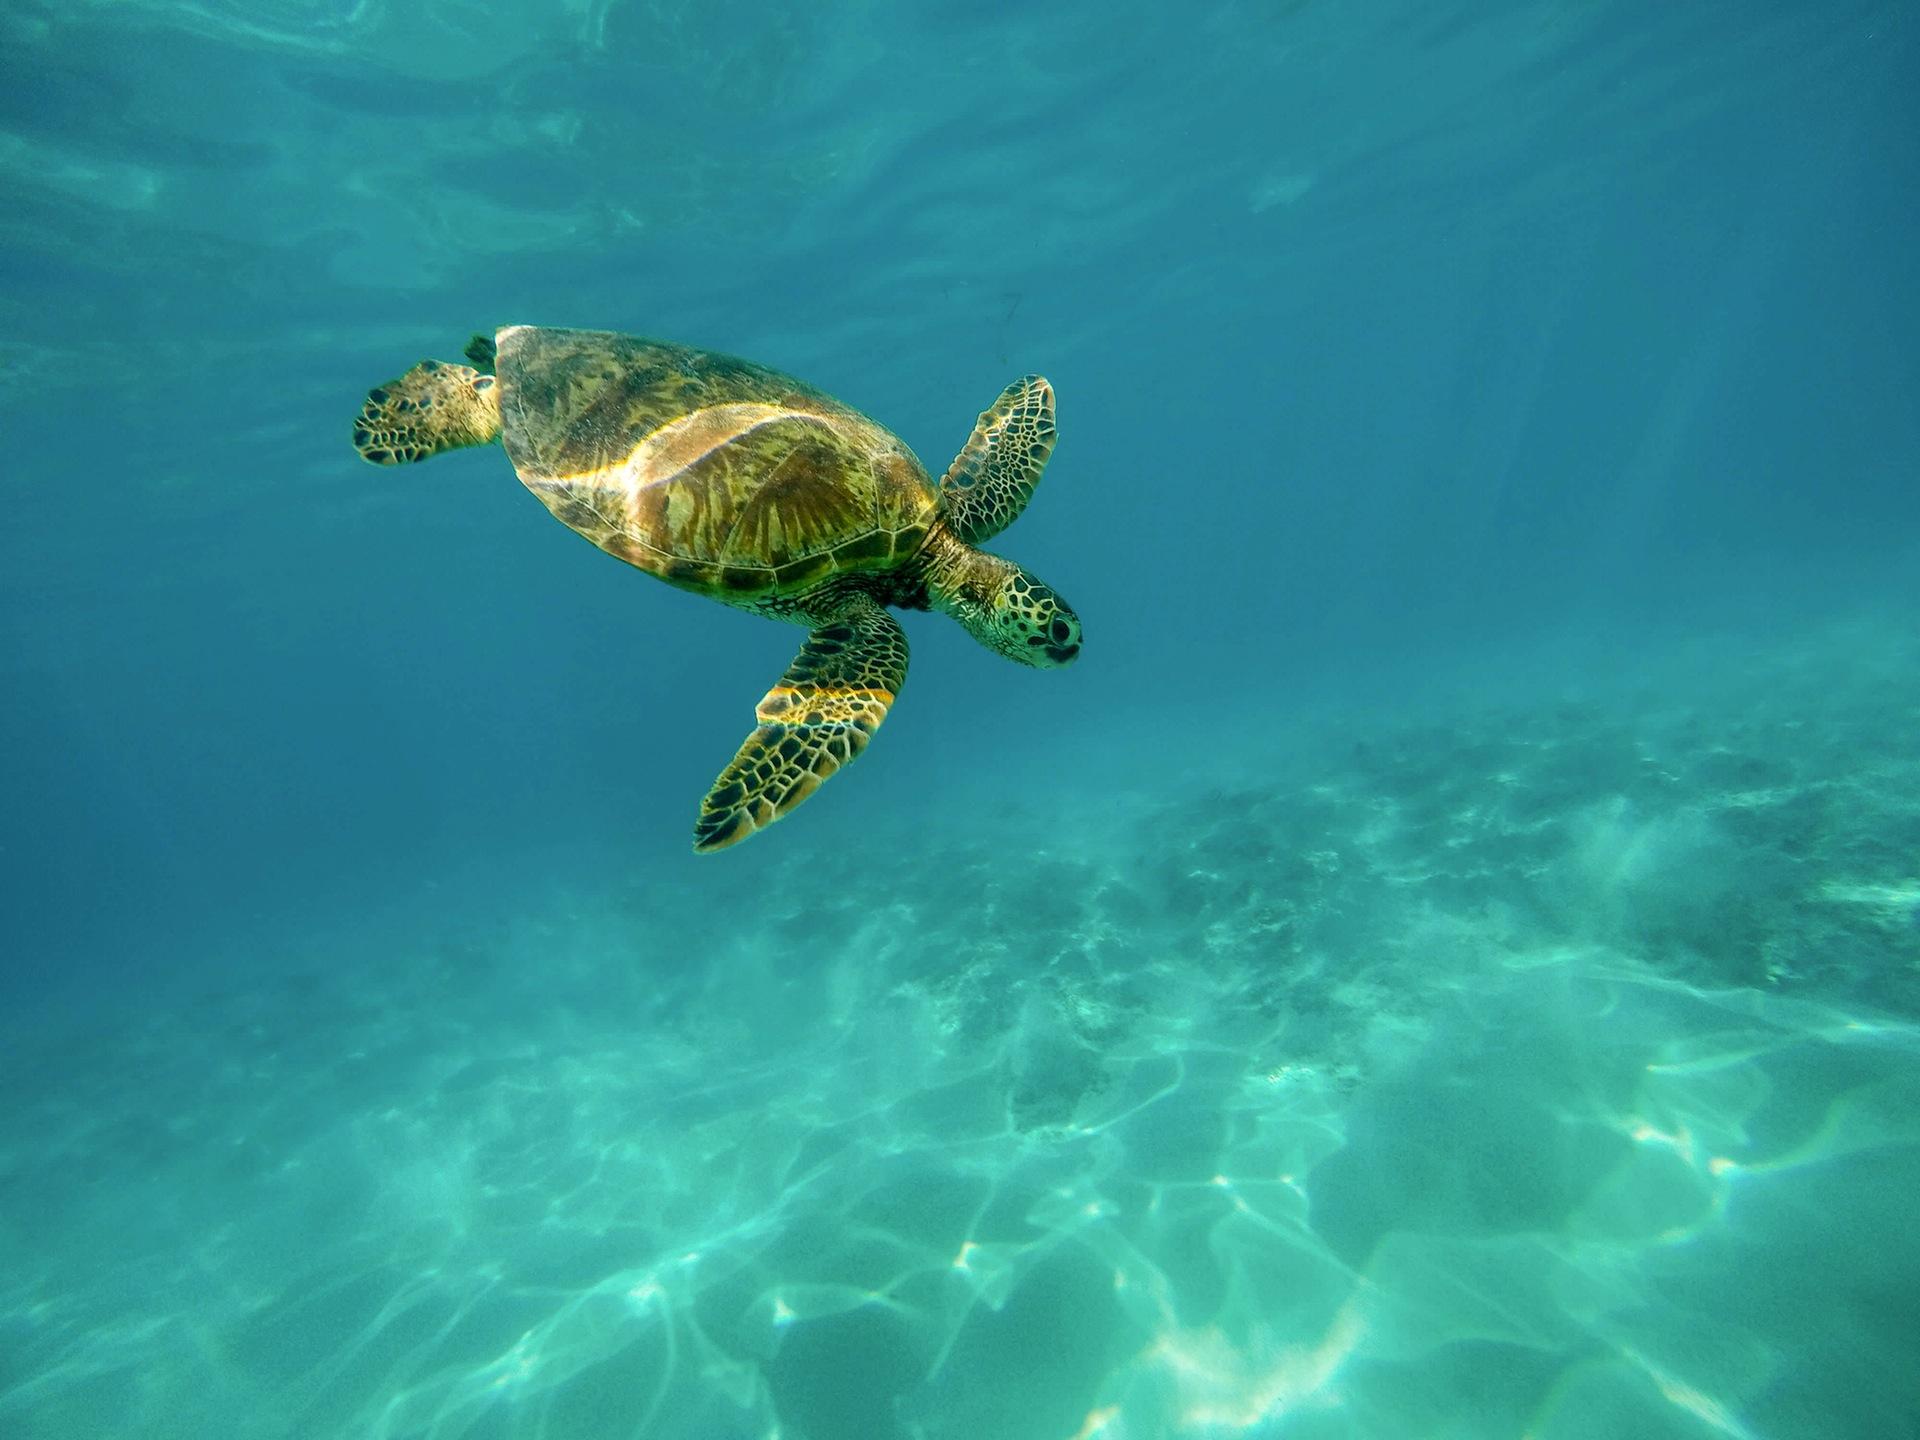 pexels-anja-stang-green-house-sea-turtle